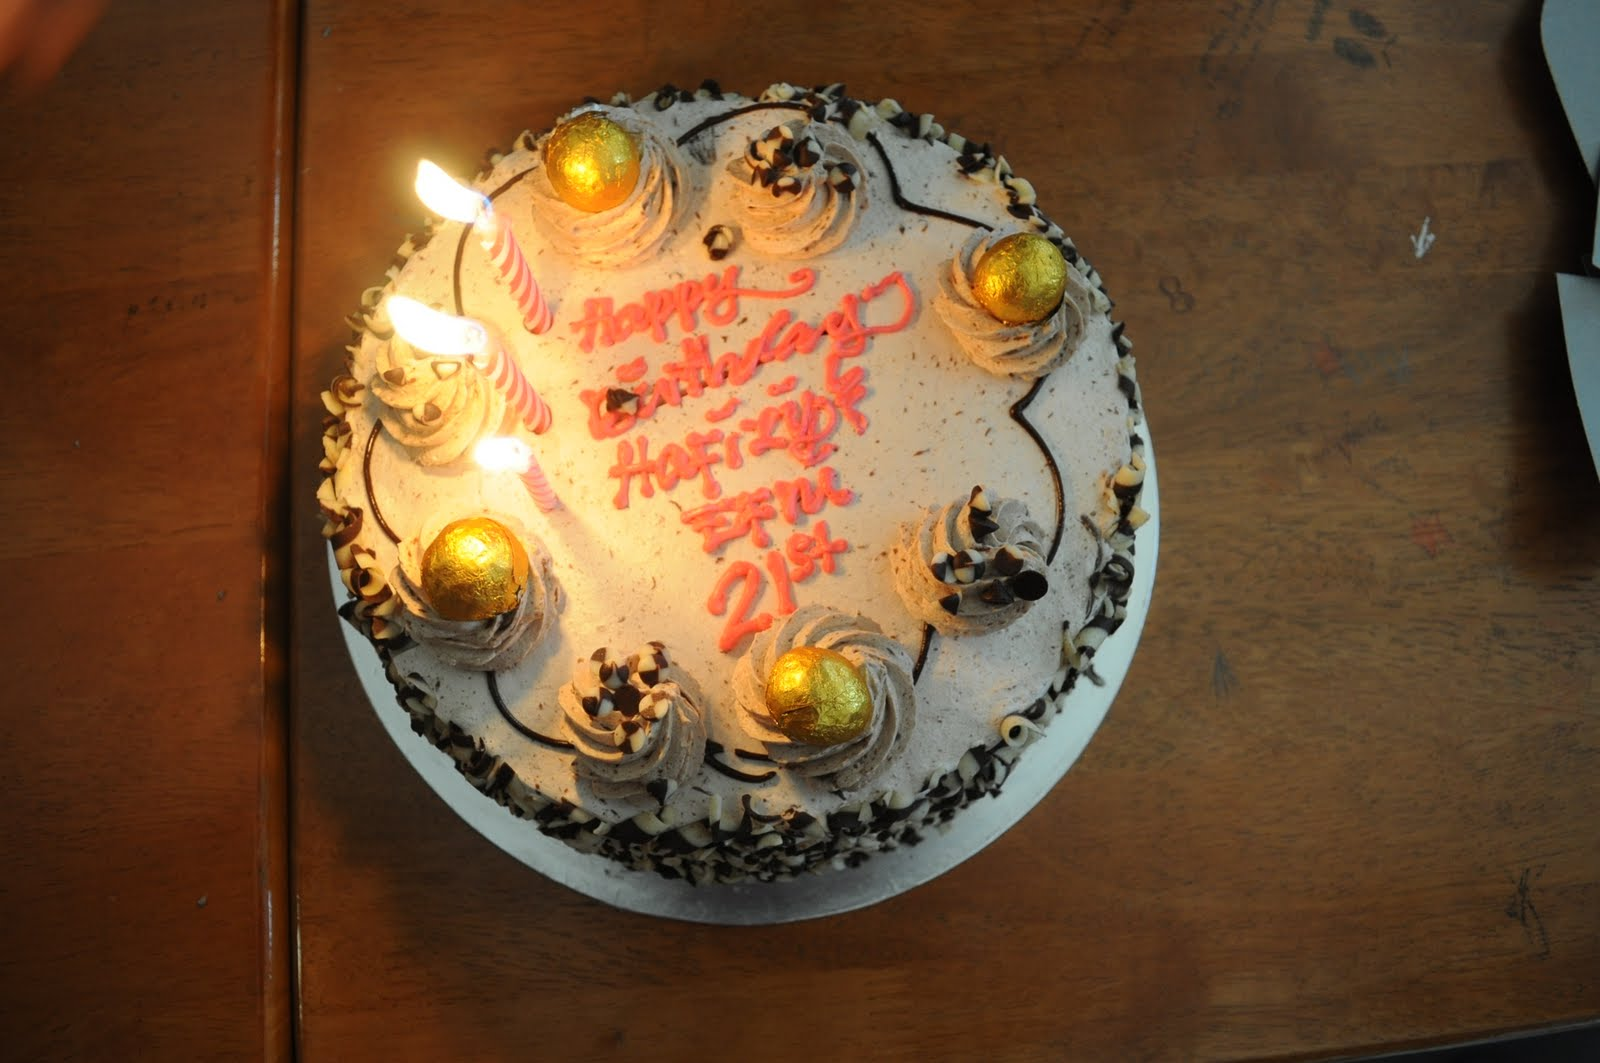 Birthday Cakes Edinburgh ~ Pin classmates birthday cake wedding cakes scotland edinburgh glasgow on pinterest